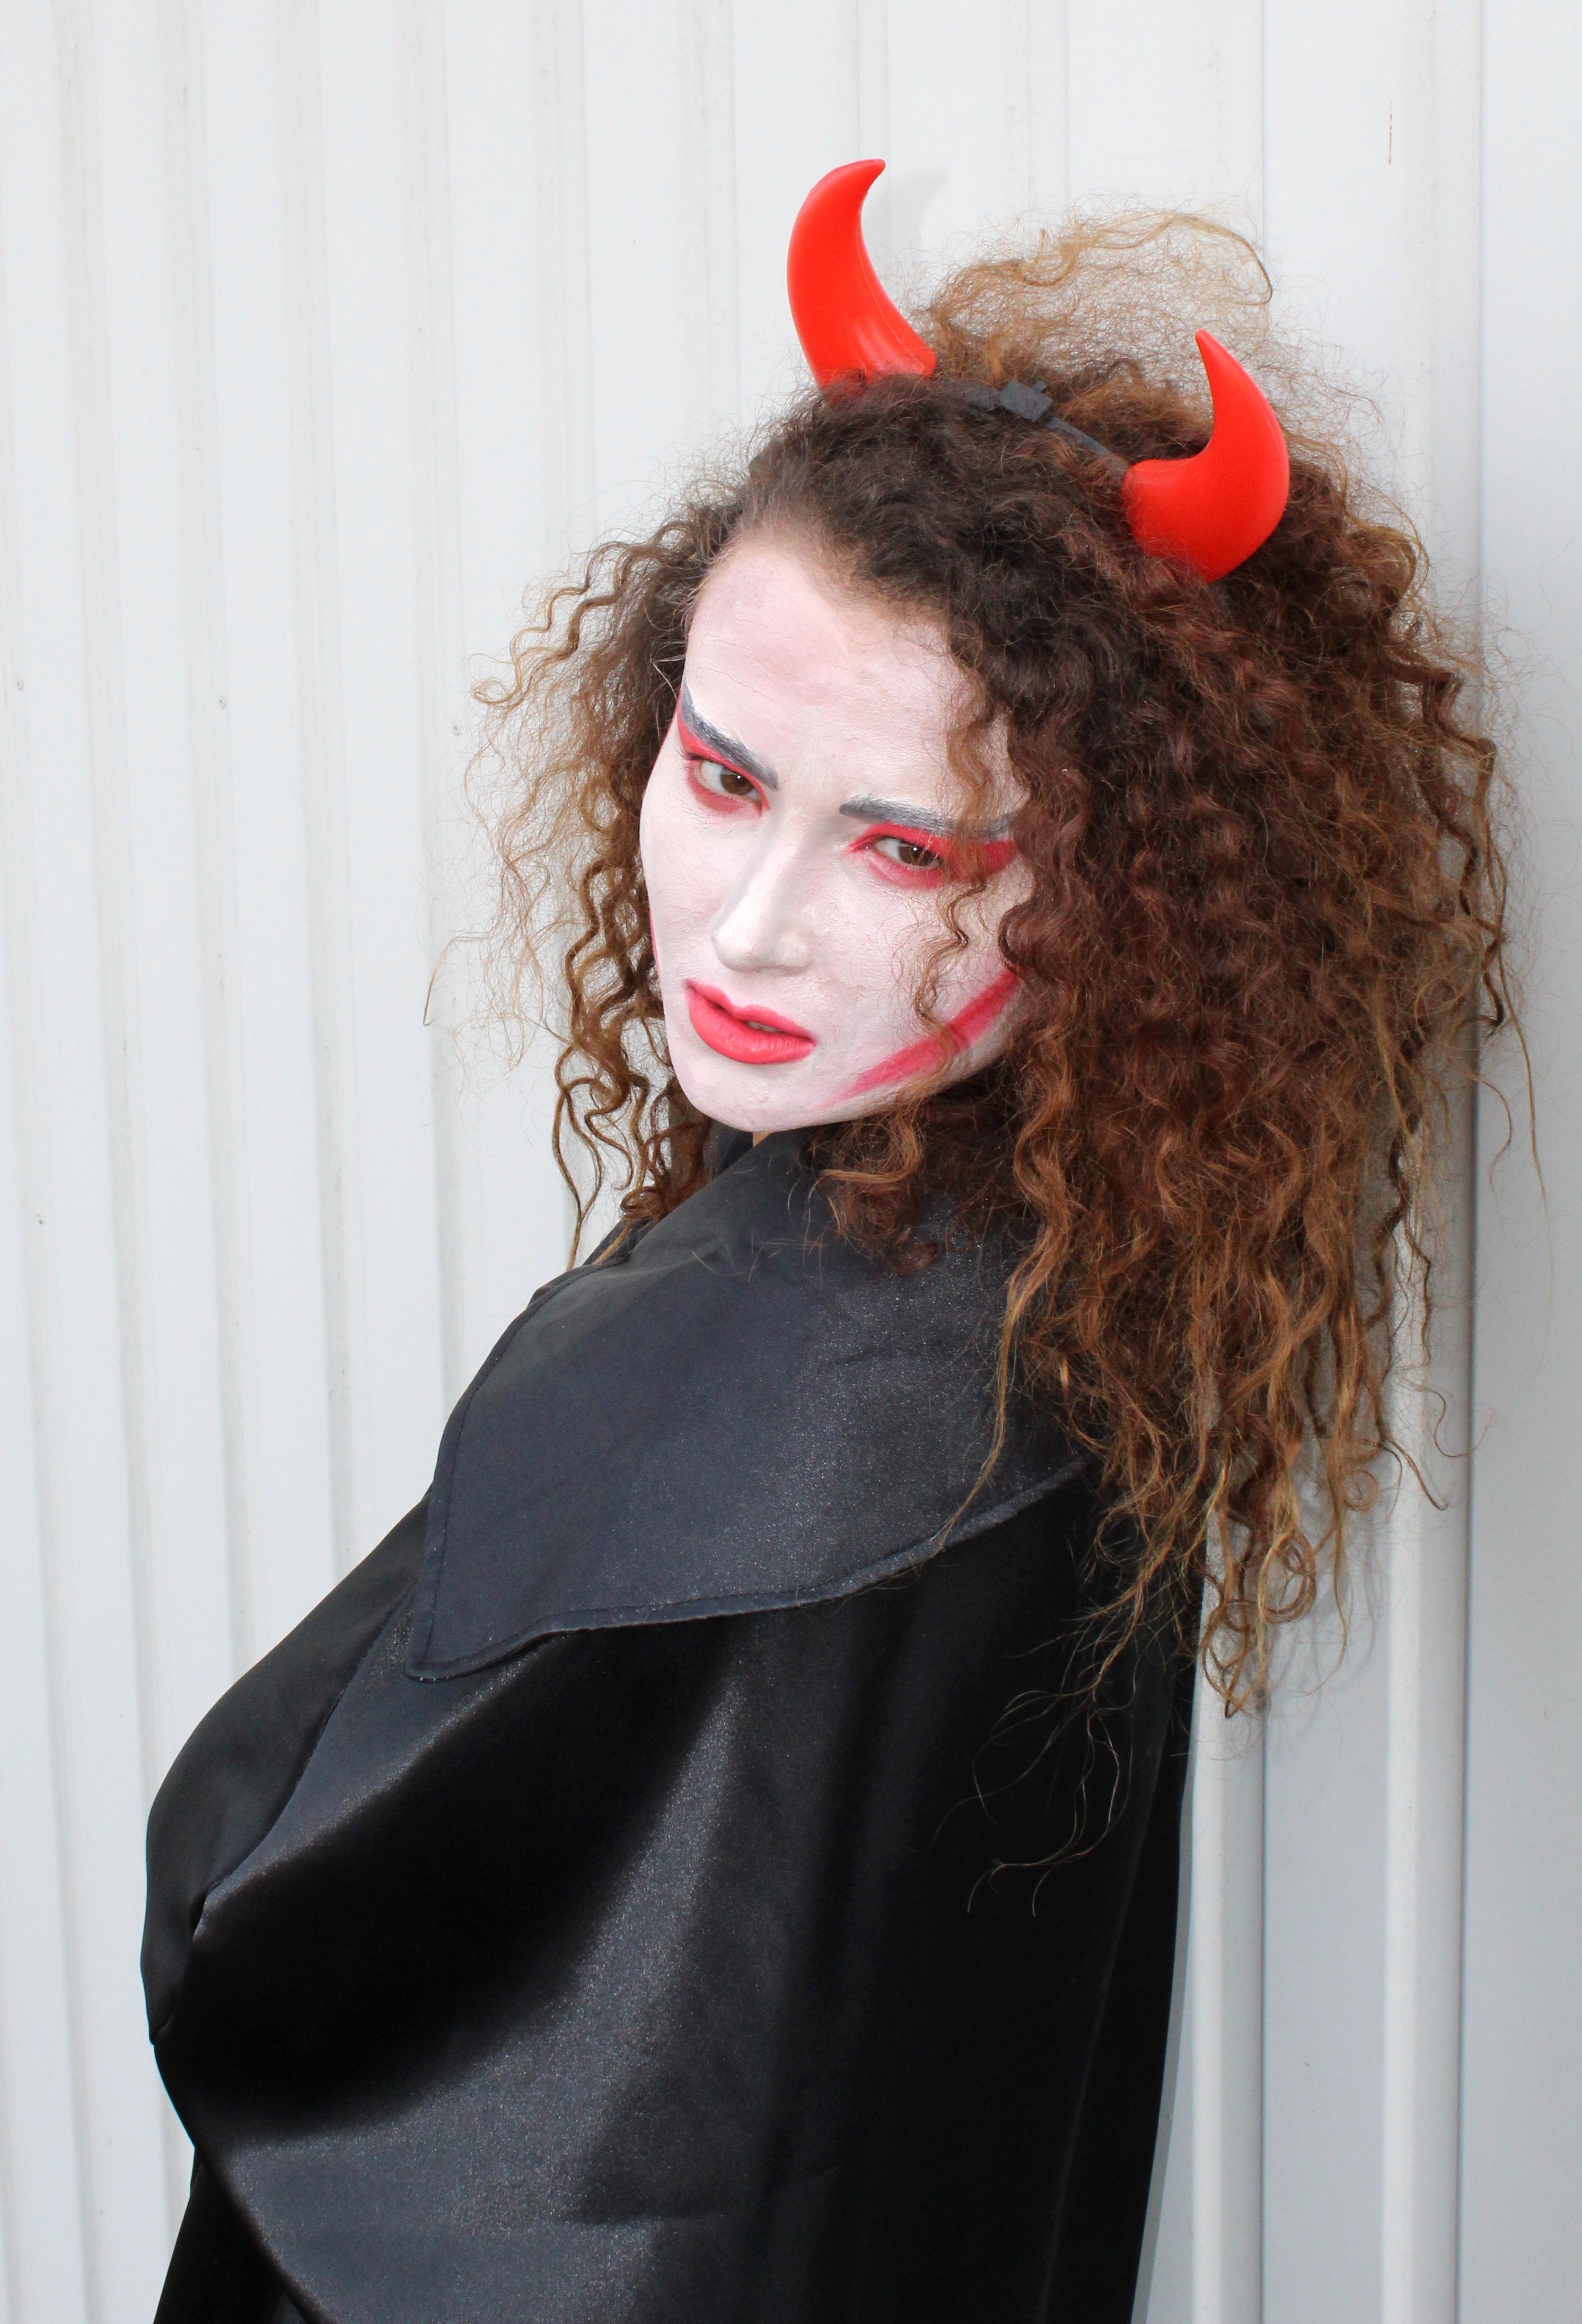 Teufels Domino Karneval Fasching Maske Satan Teufel Helloween